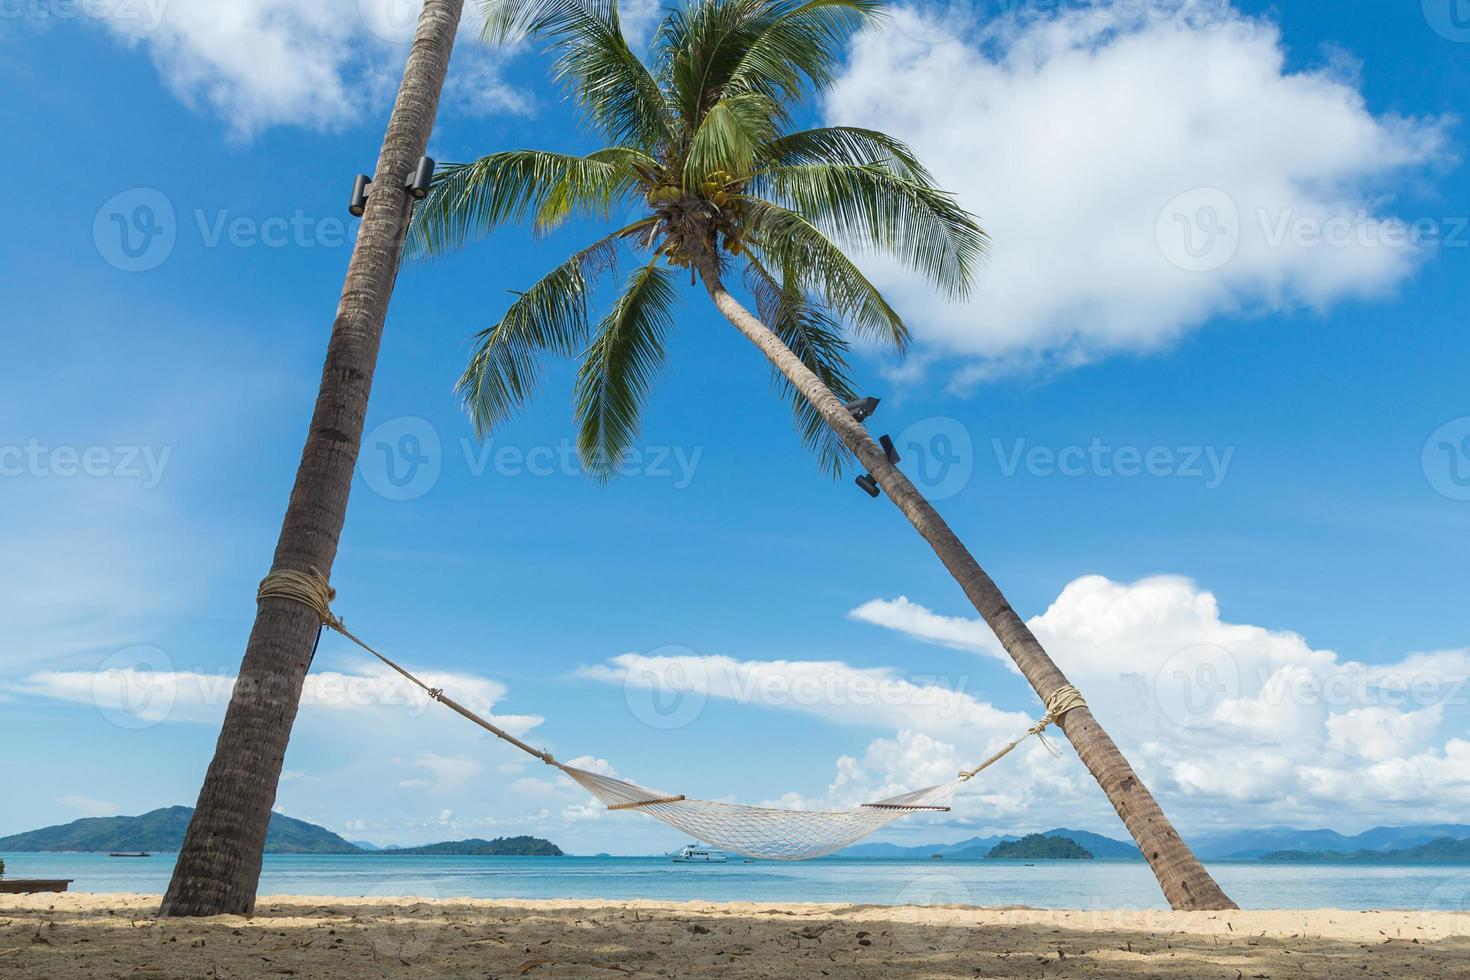 Beach stretcher photo